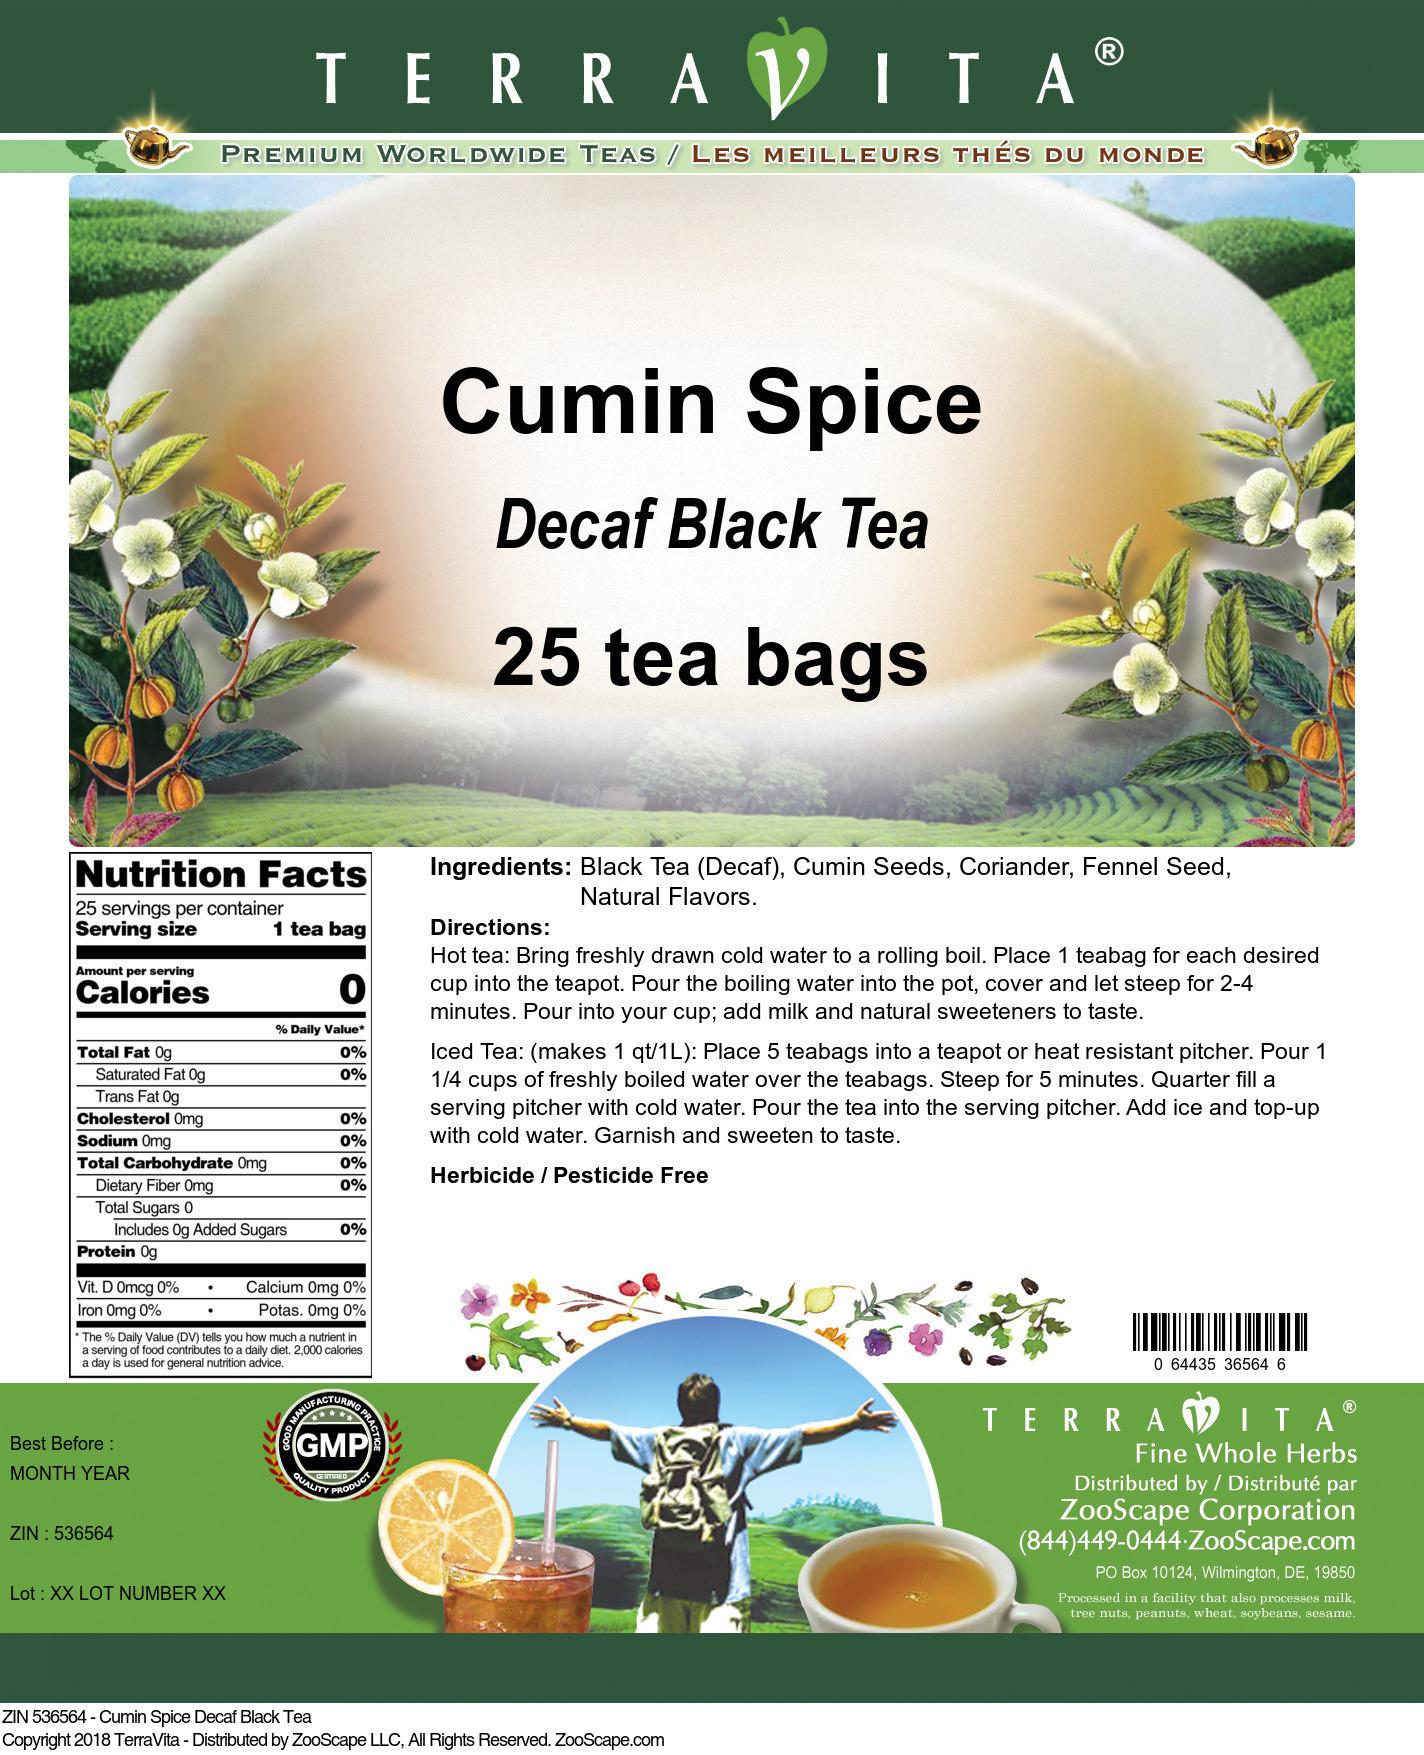 Cumin Spice Decaf Black Tea